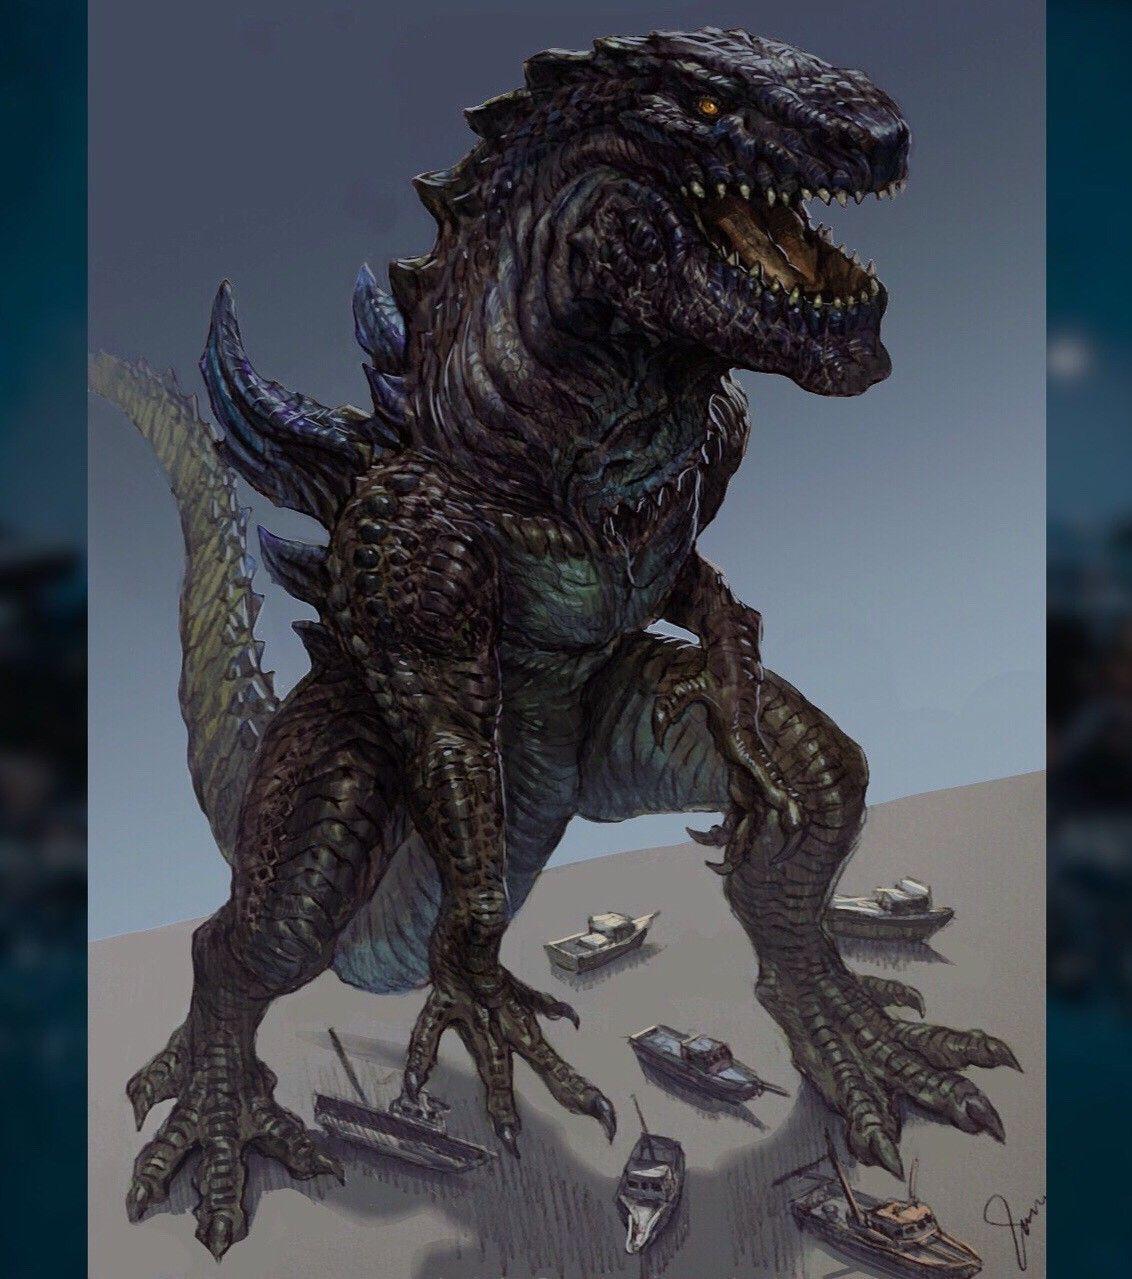 Godzilla 1998™️ (Fanart), Jaroslav Kosmina